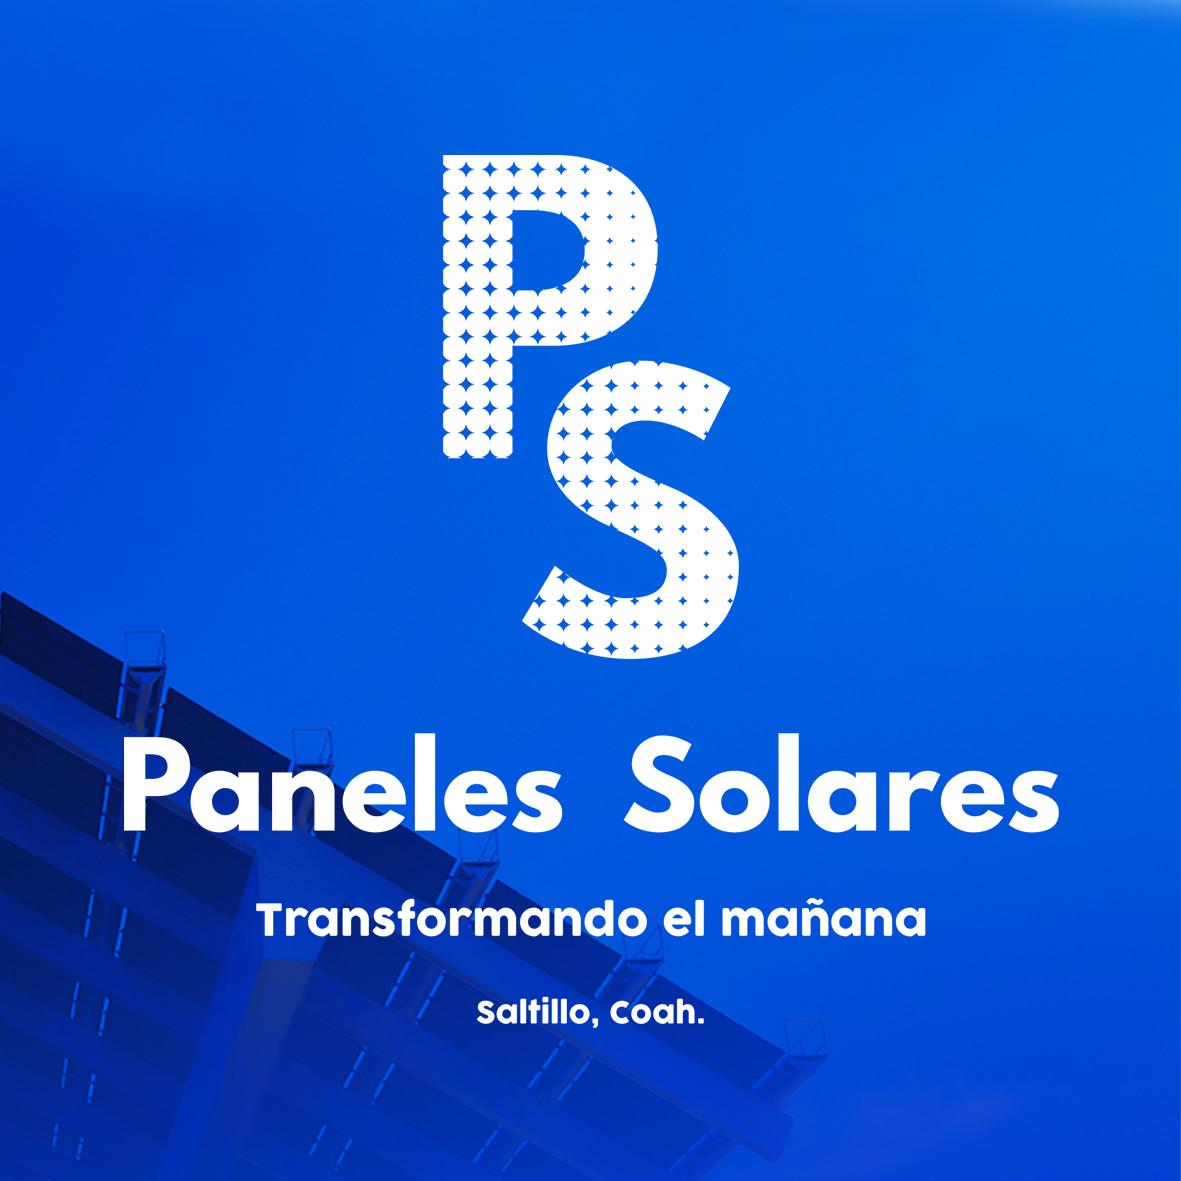 PS Paneles Solares